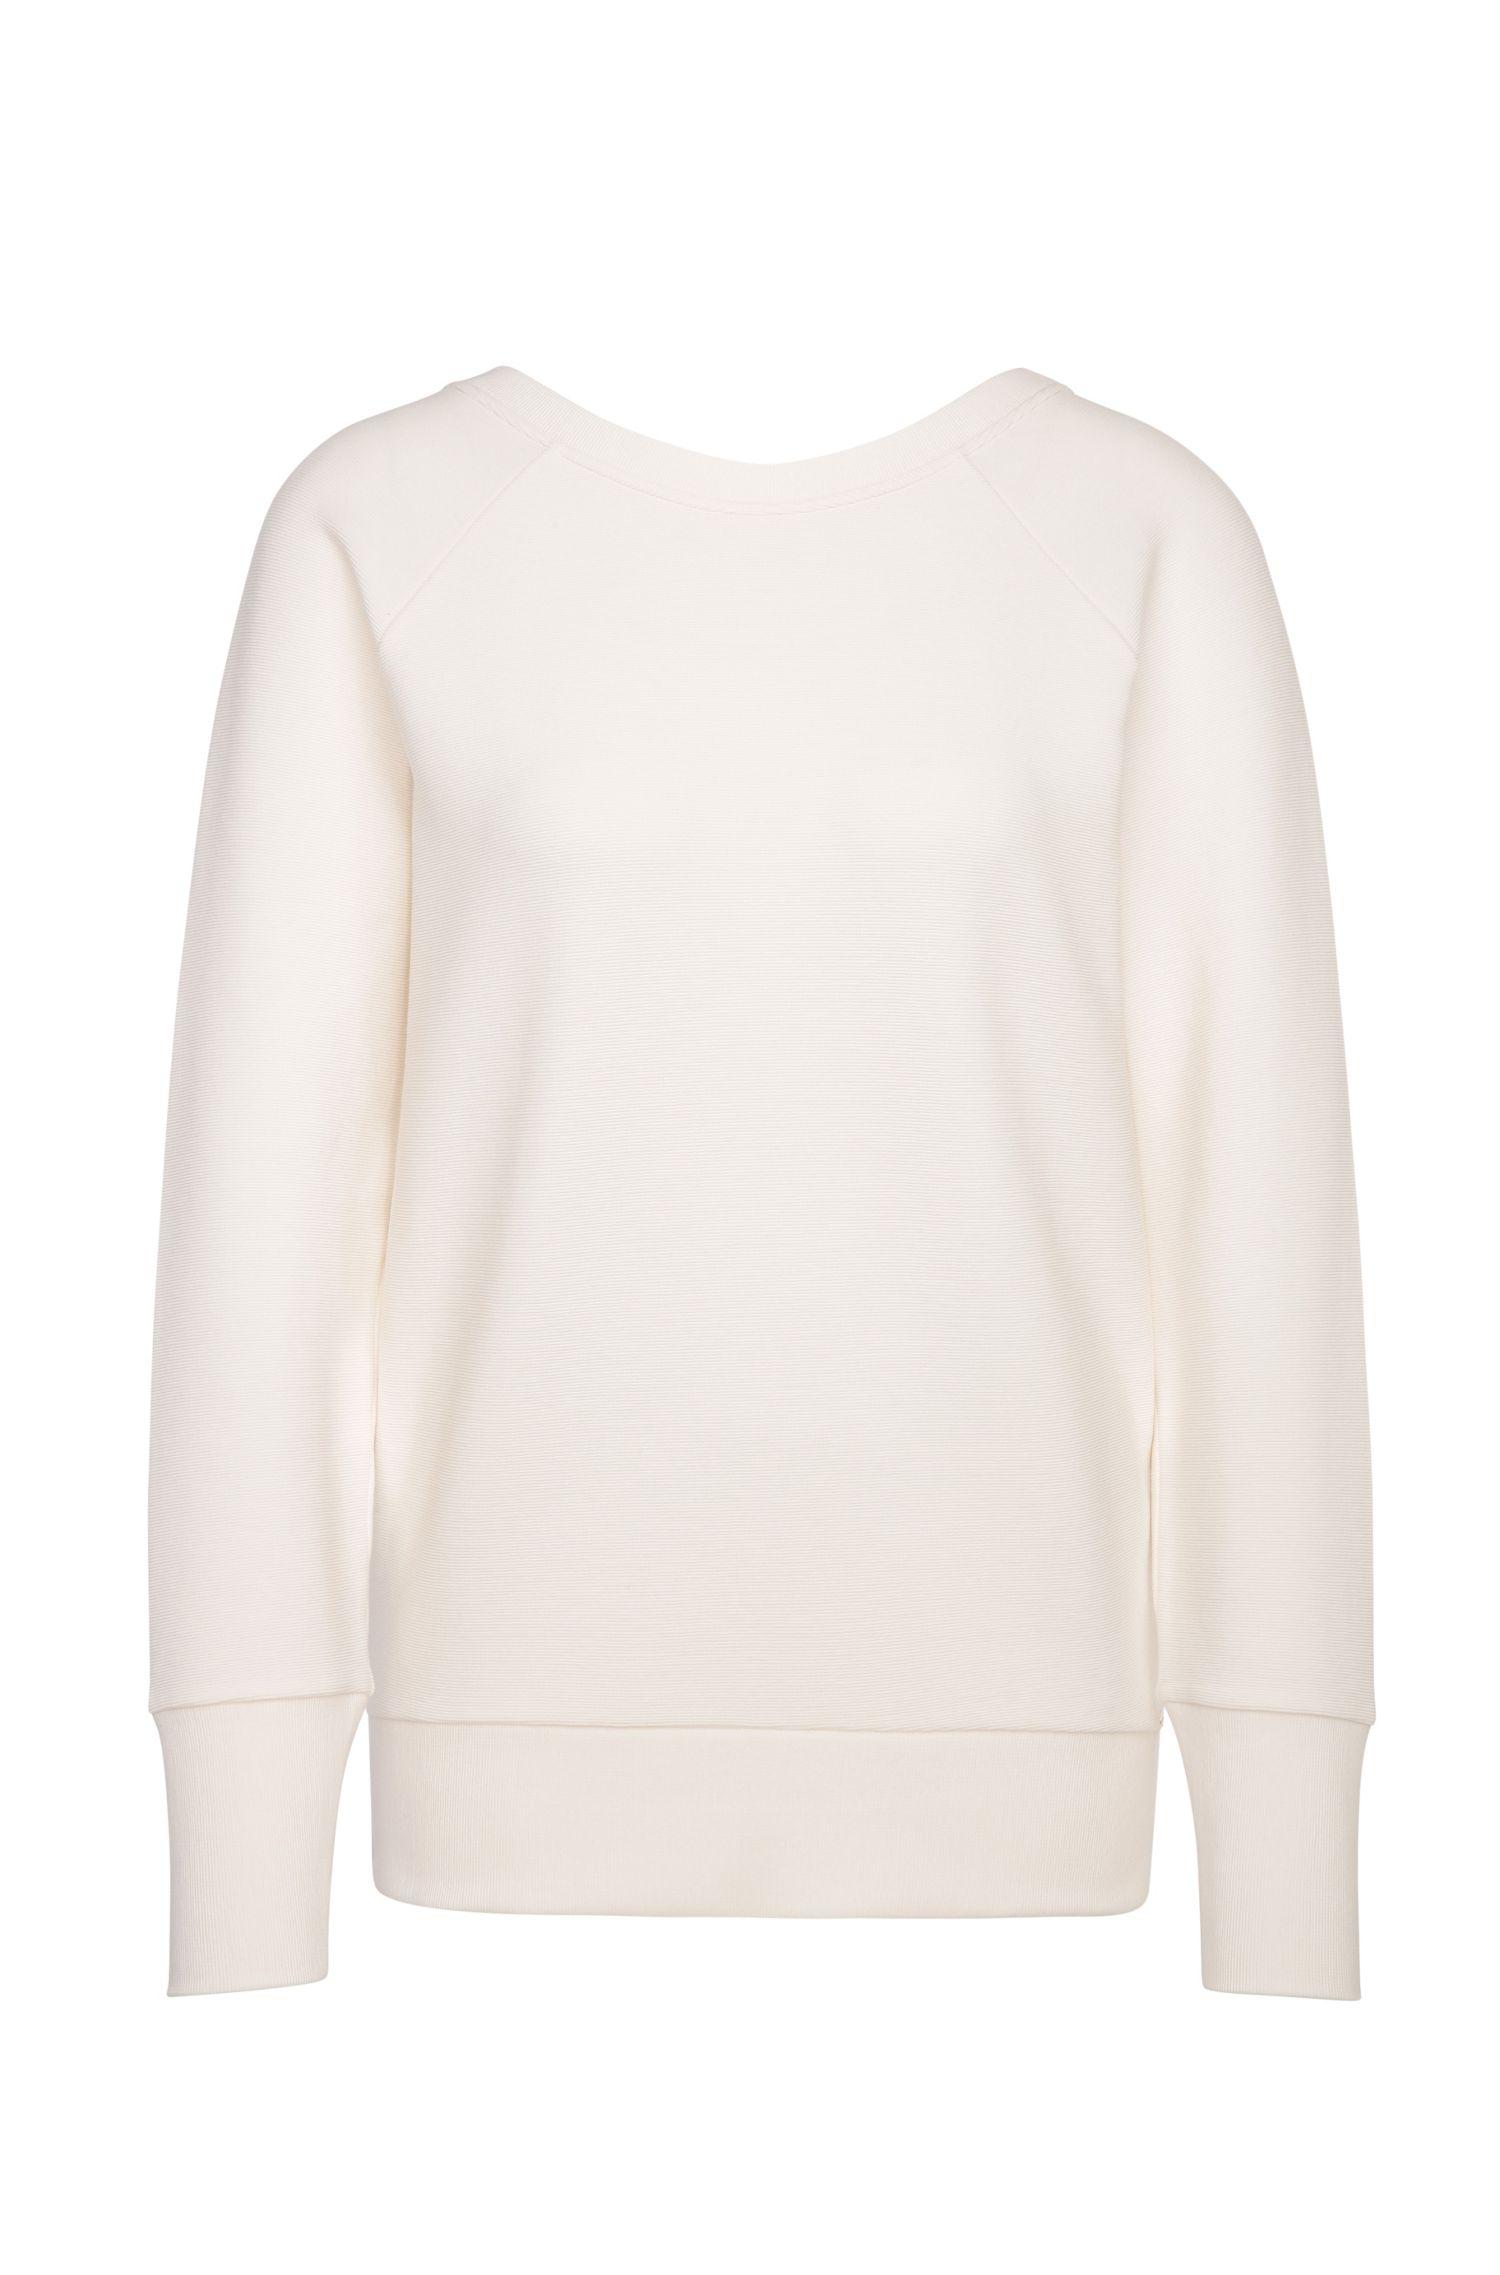 'Tawow' | Stretch Cotton Blend Ribbed Sweatshirt